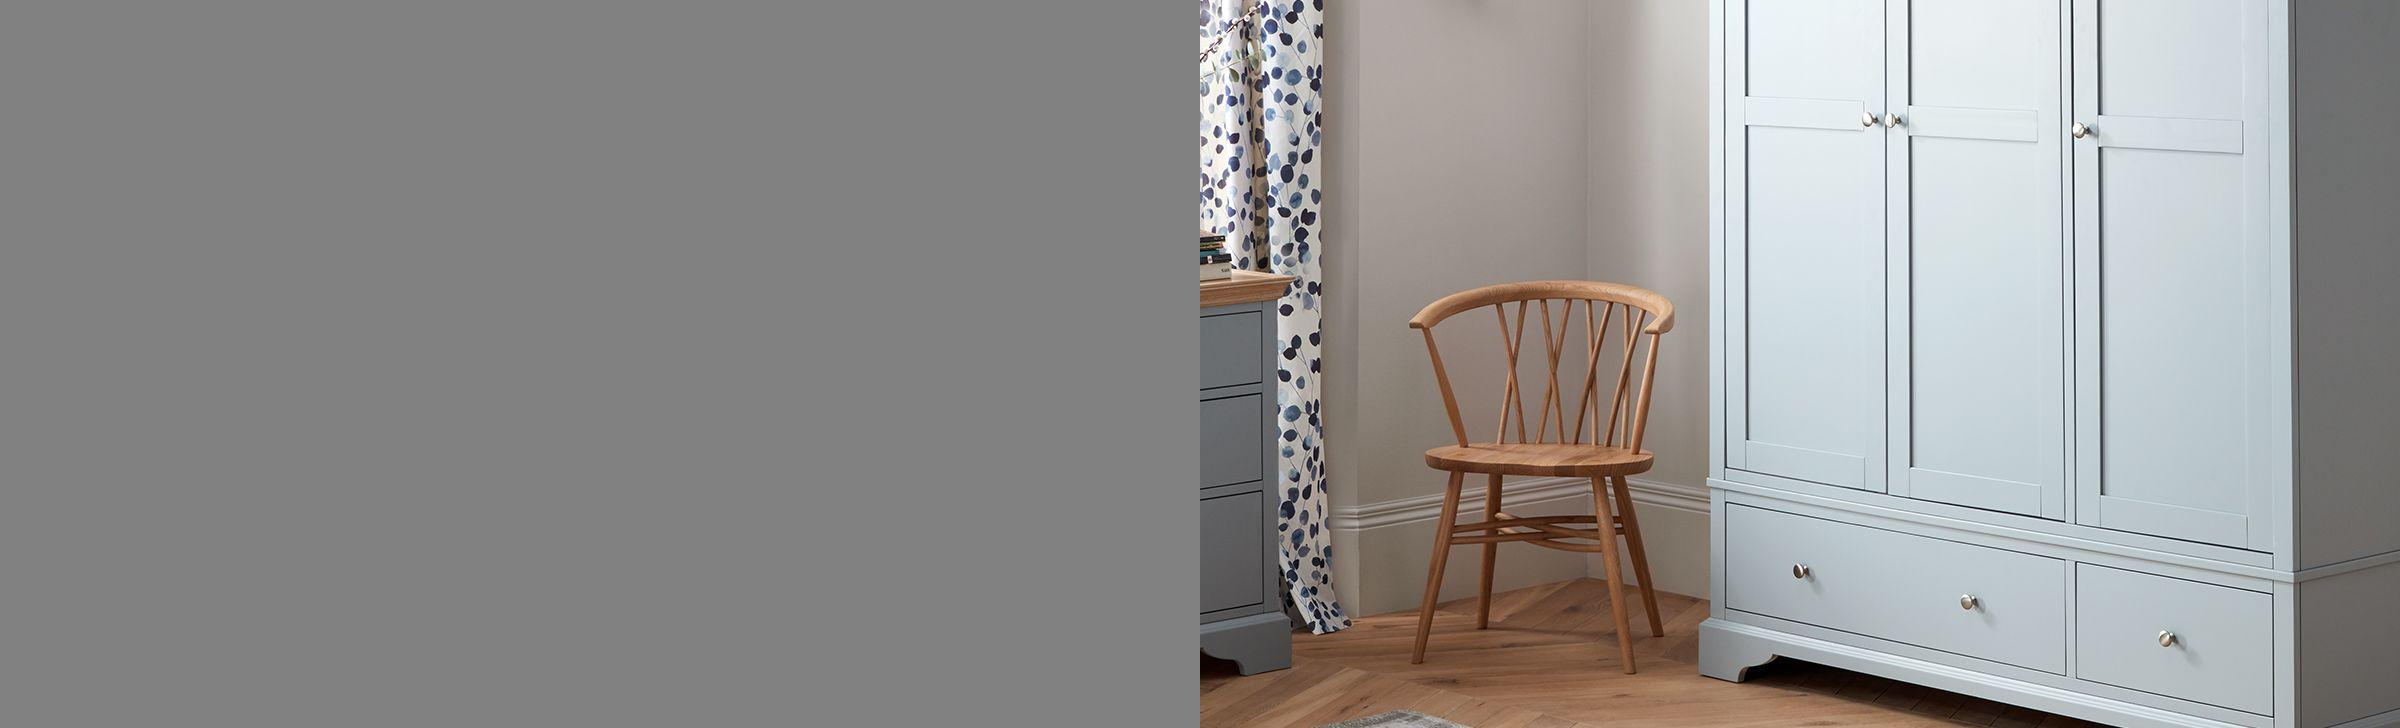 Surprising Double Wardrobes Bedroom Furniture John Lewis Partners Home Interior And Landscaping Oversignezvosmurscom